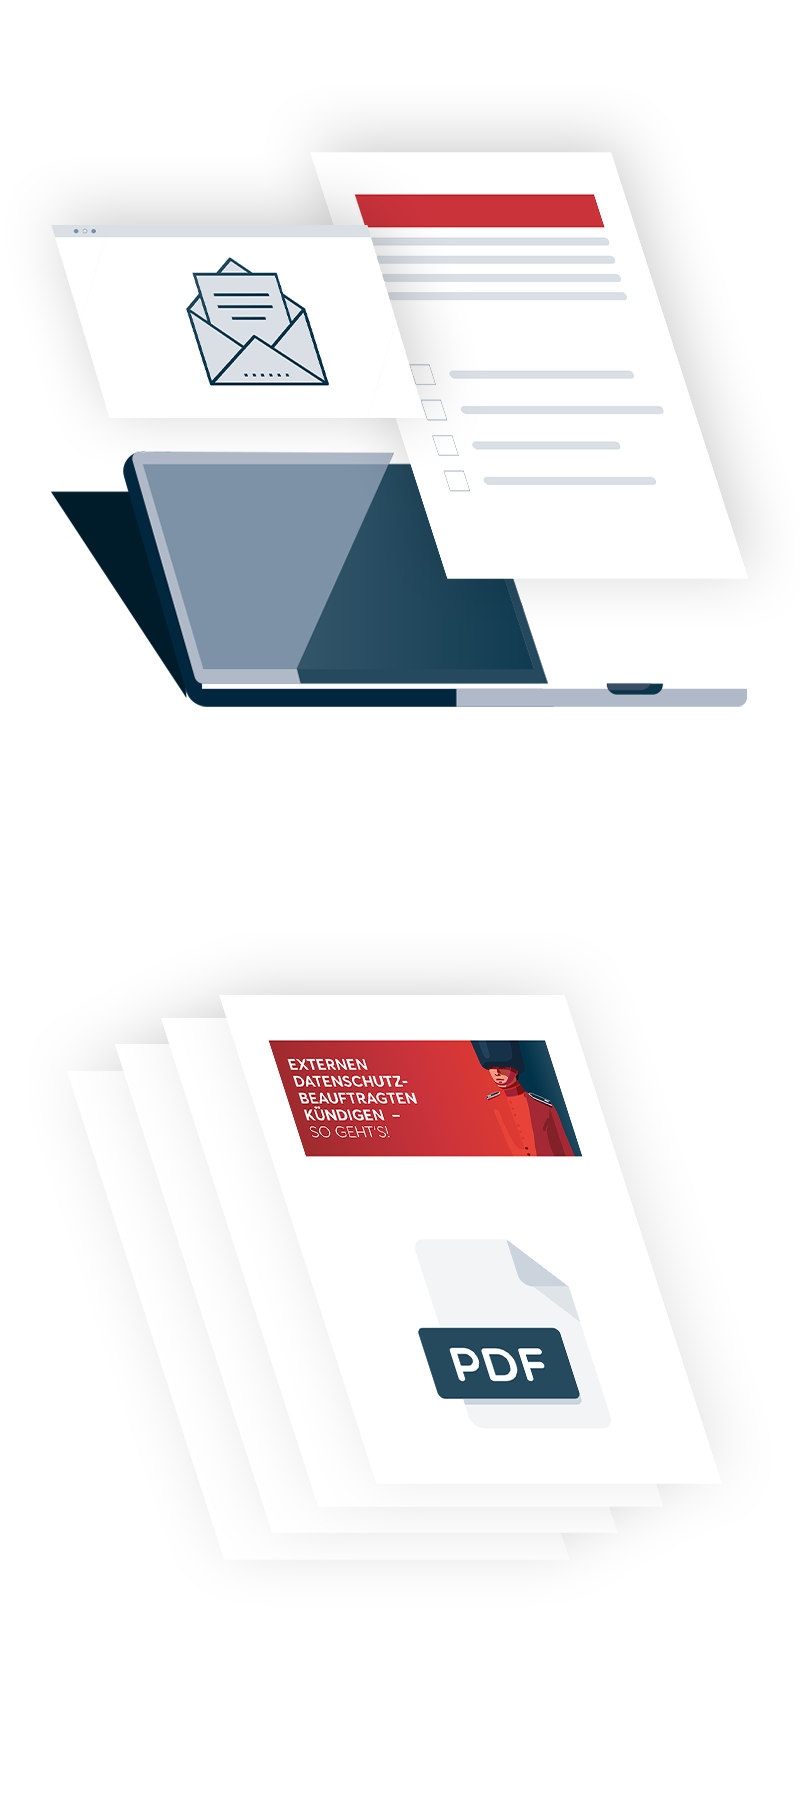 Kündigung des externen Datenschutzbeauftragten (inkl. Checkliste)